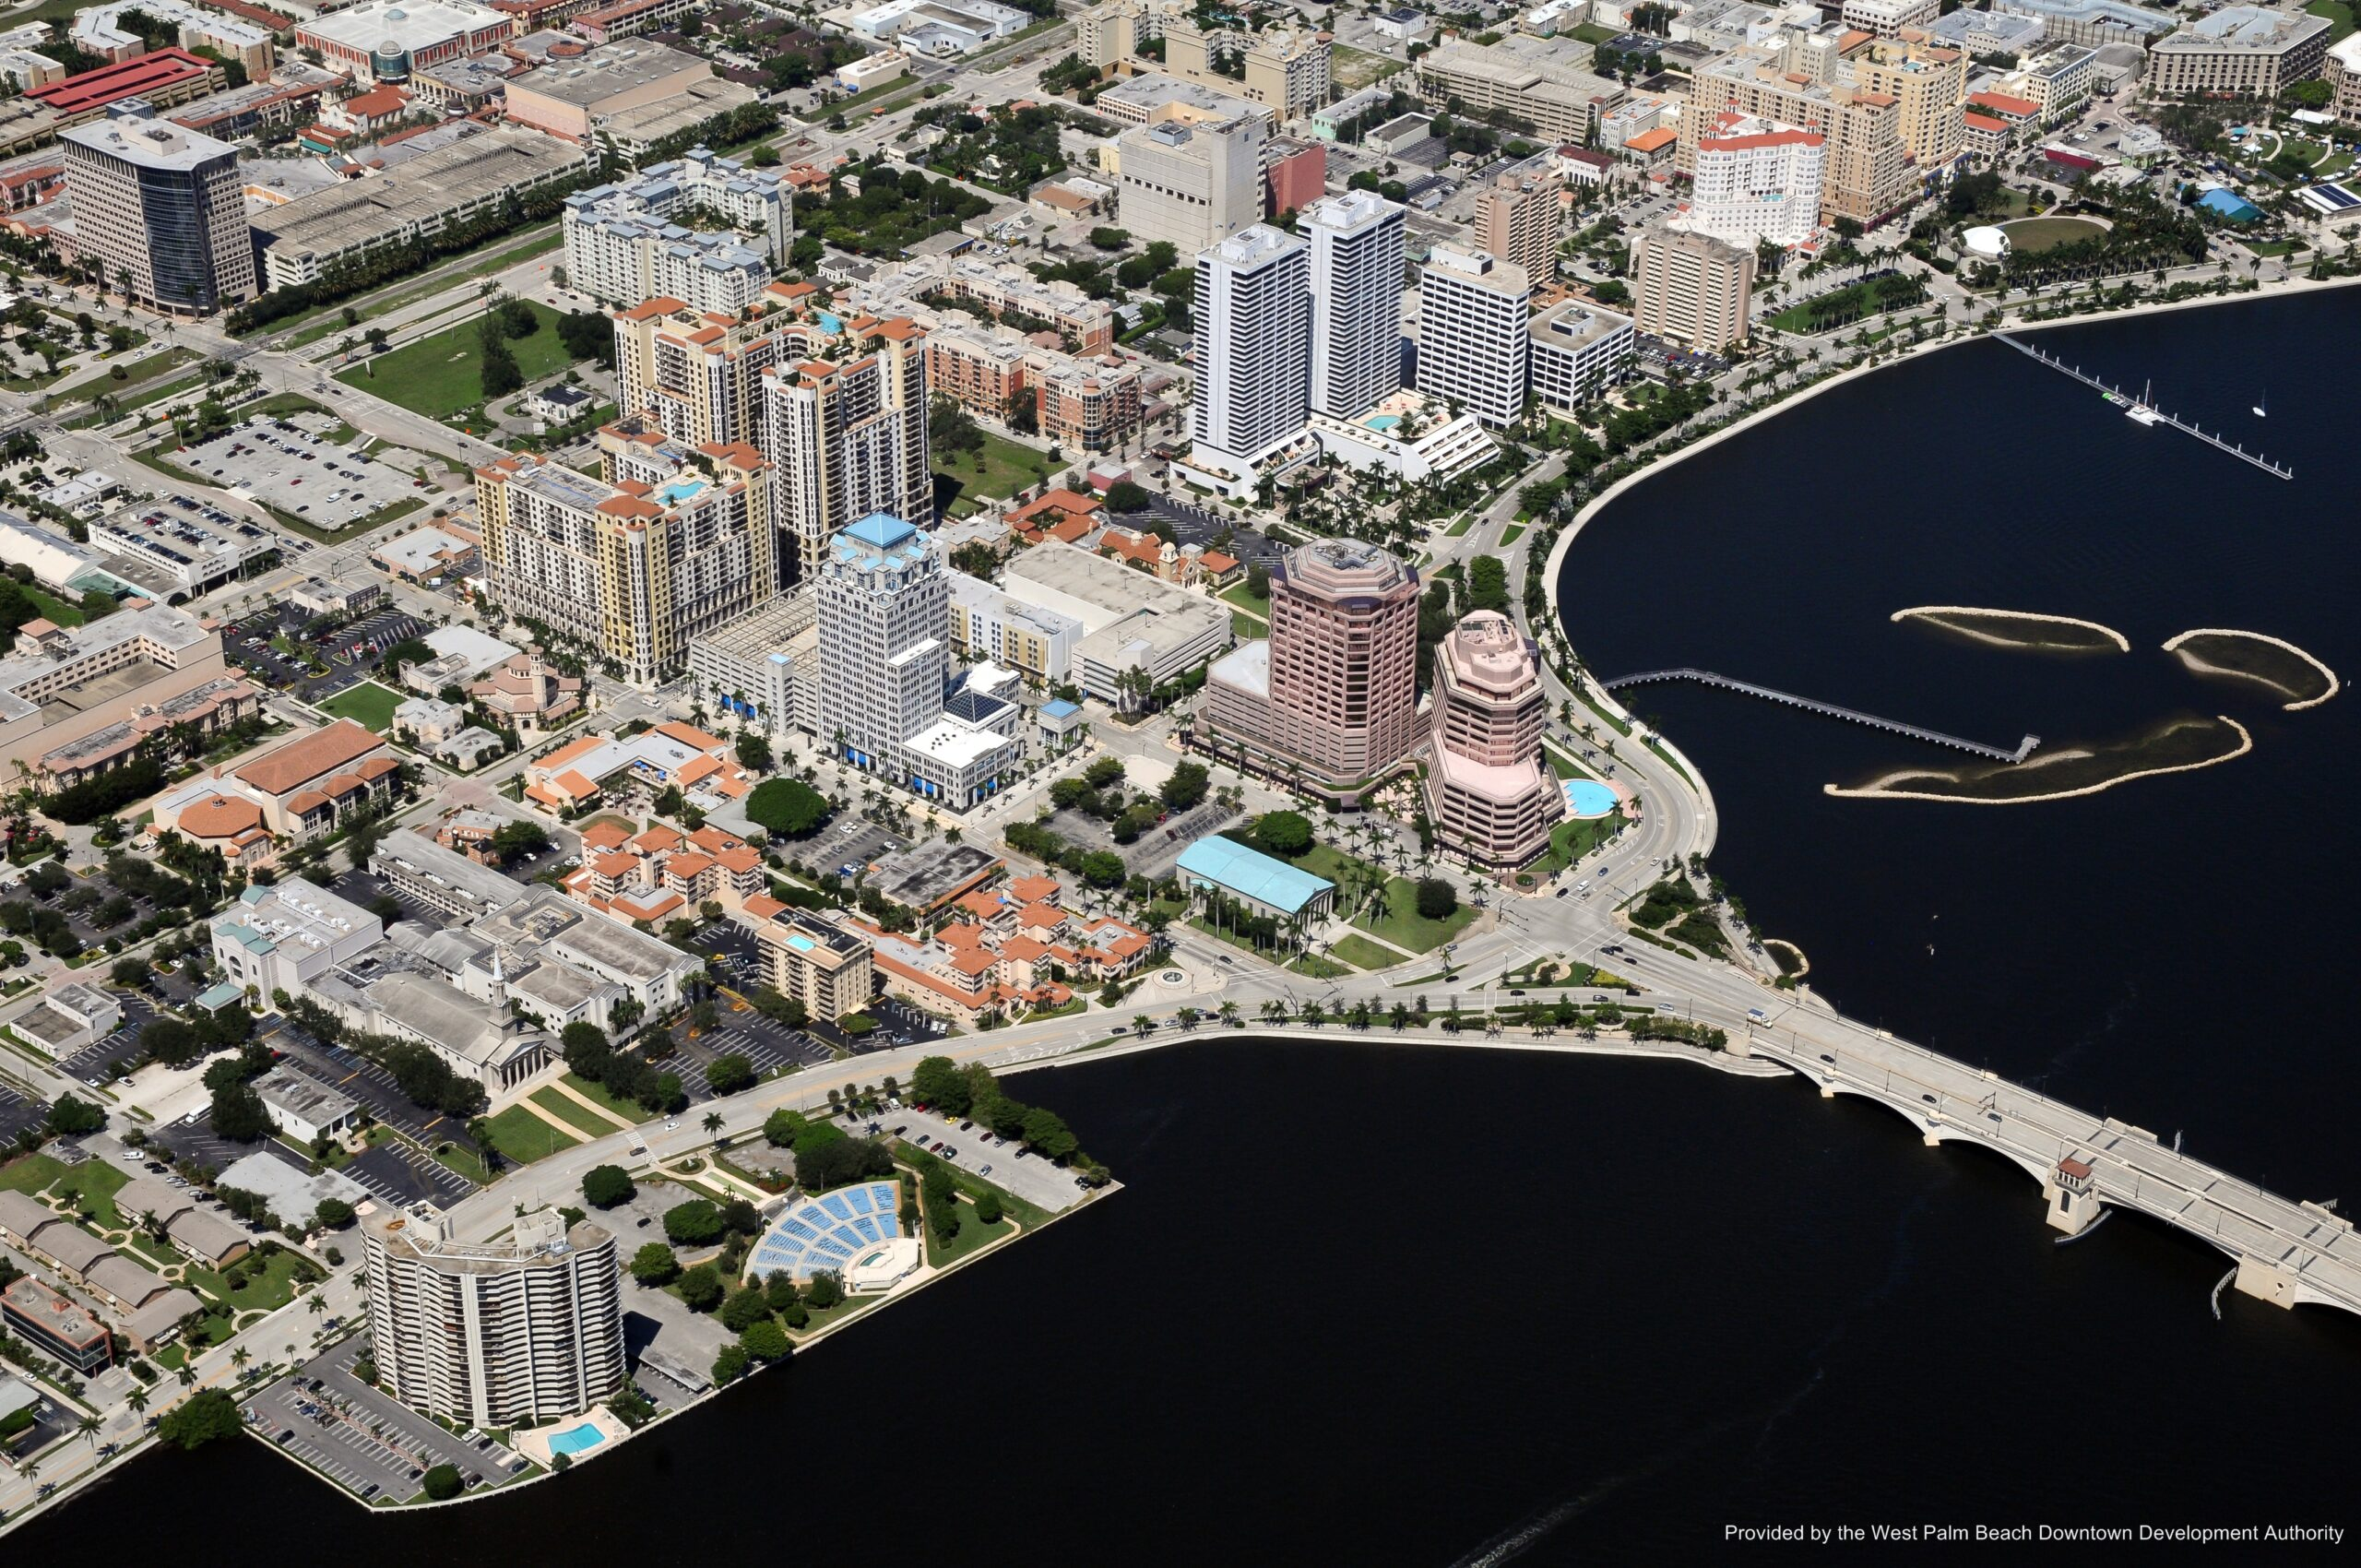 West Palm Beach Downtown Development